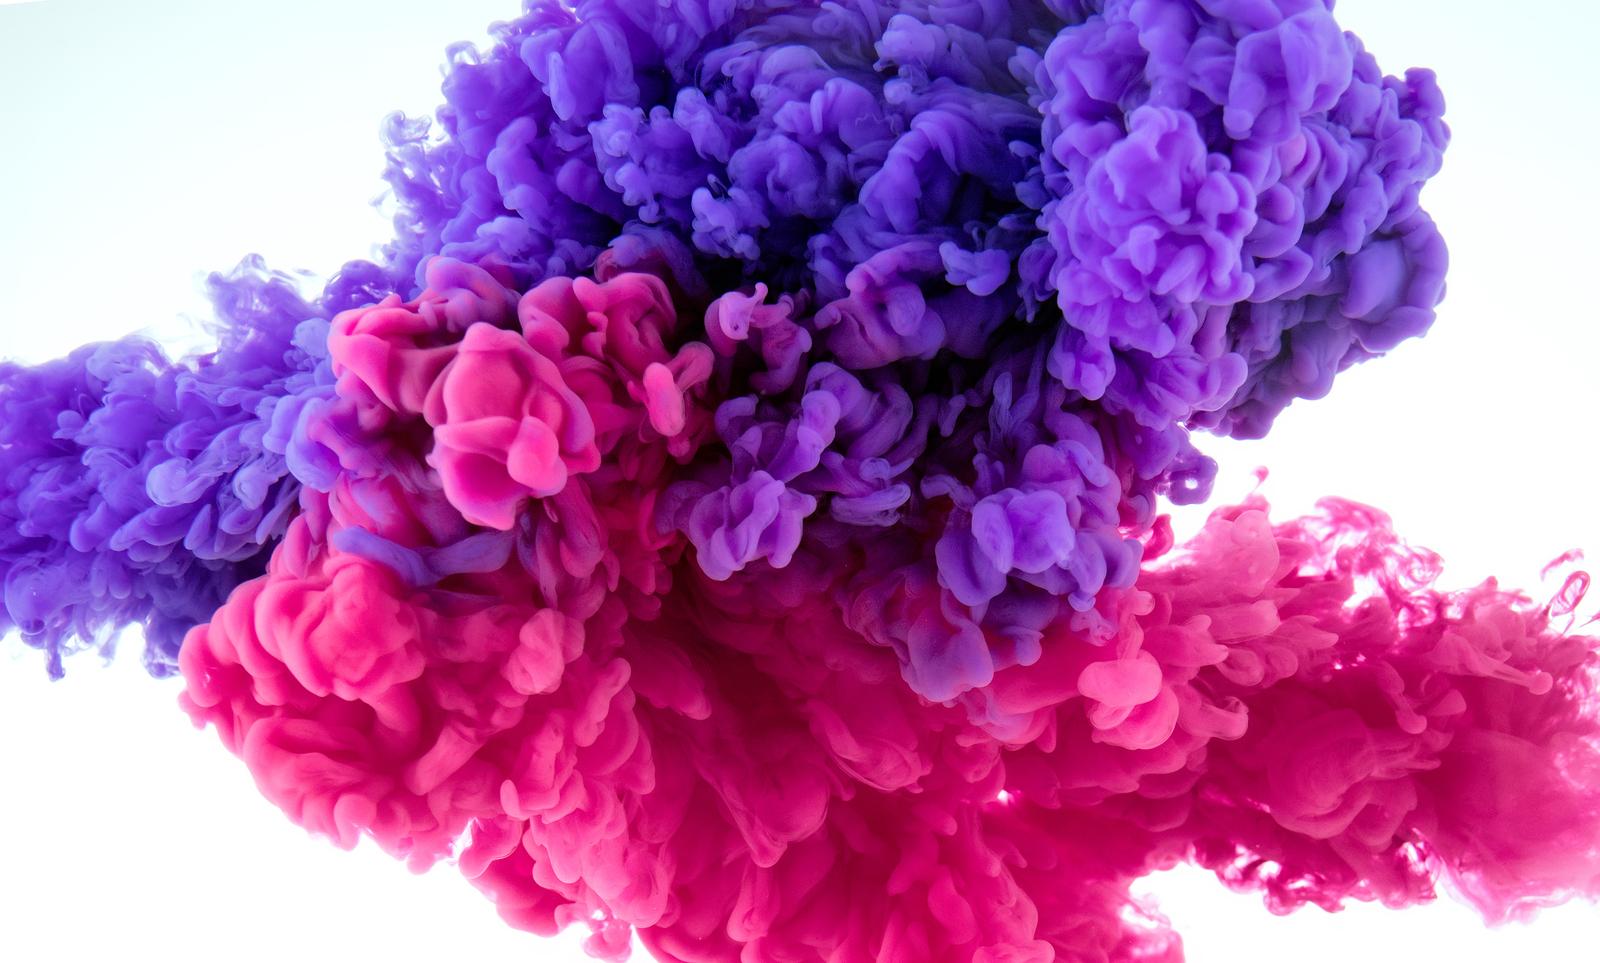 bigstock-ink-color-splash-in-water--tw-187420771.jpg